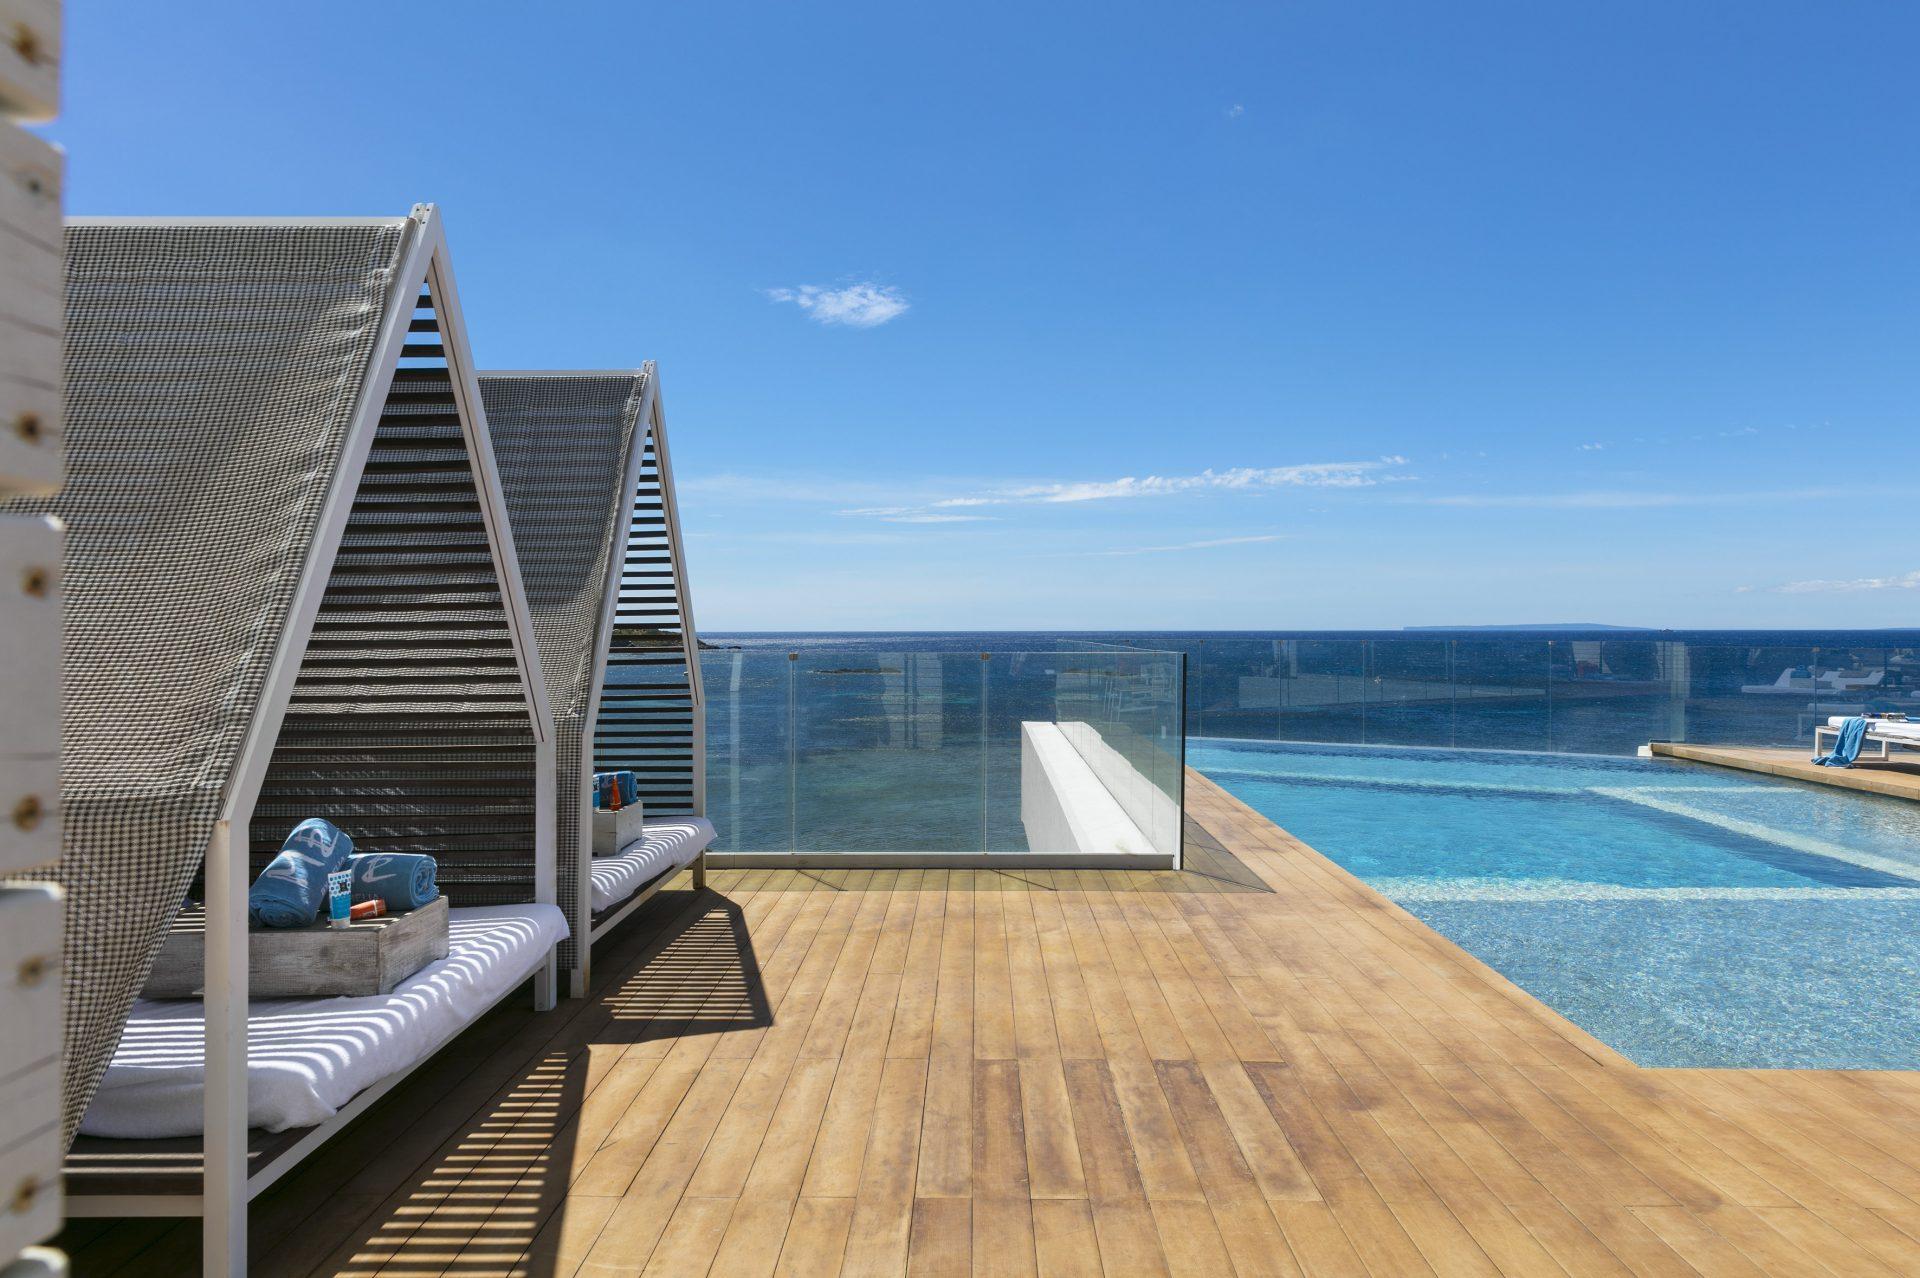 321ME Ibiza Terrace Vip Pool The Rooftop